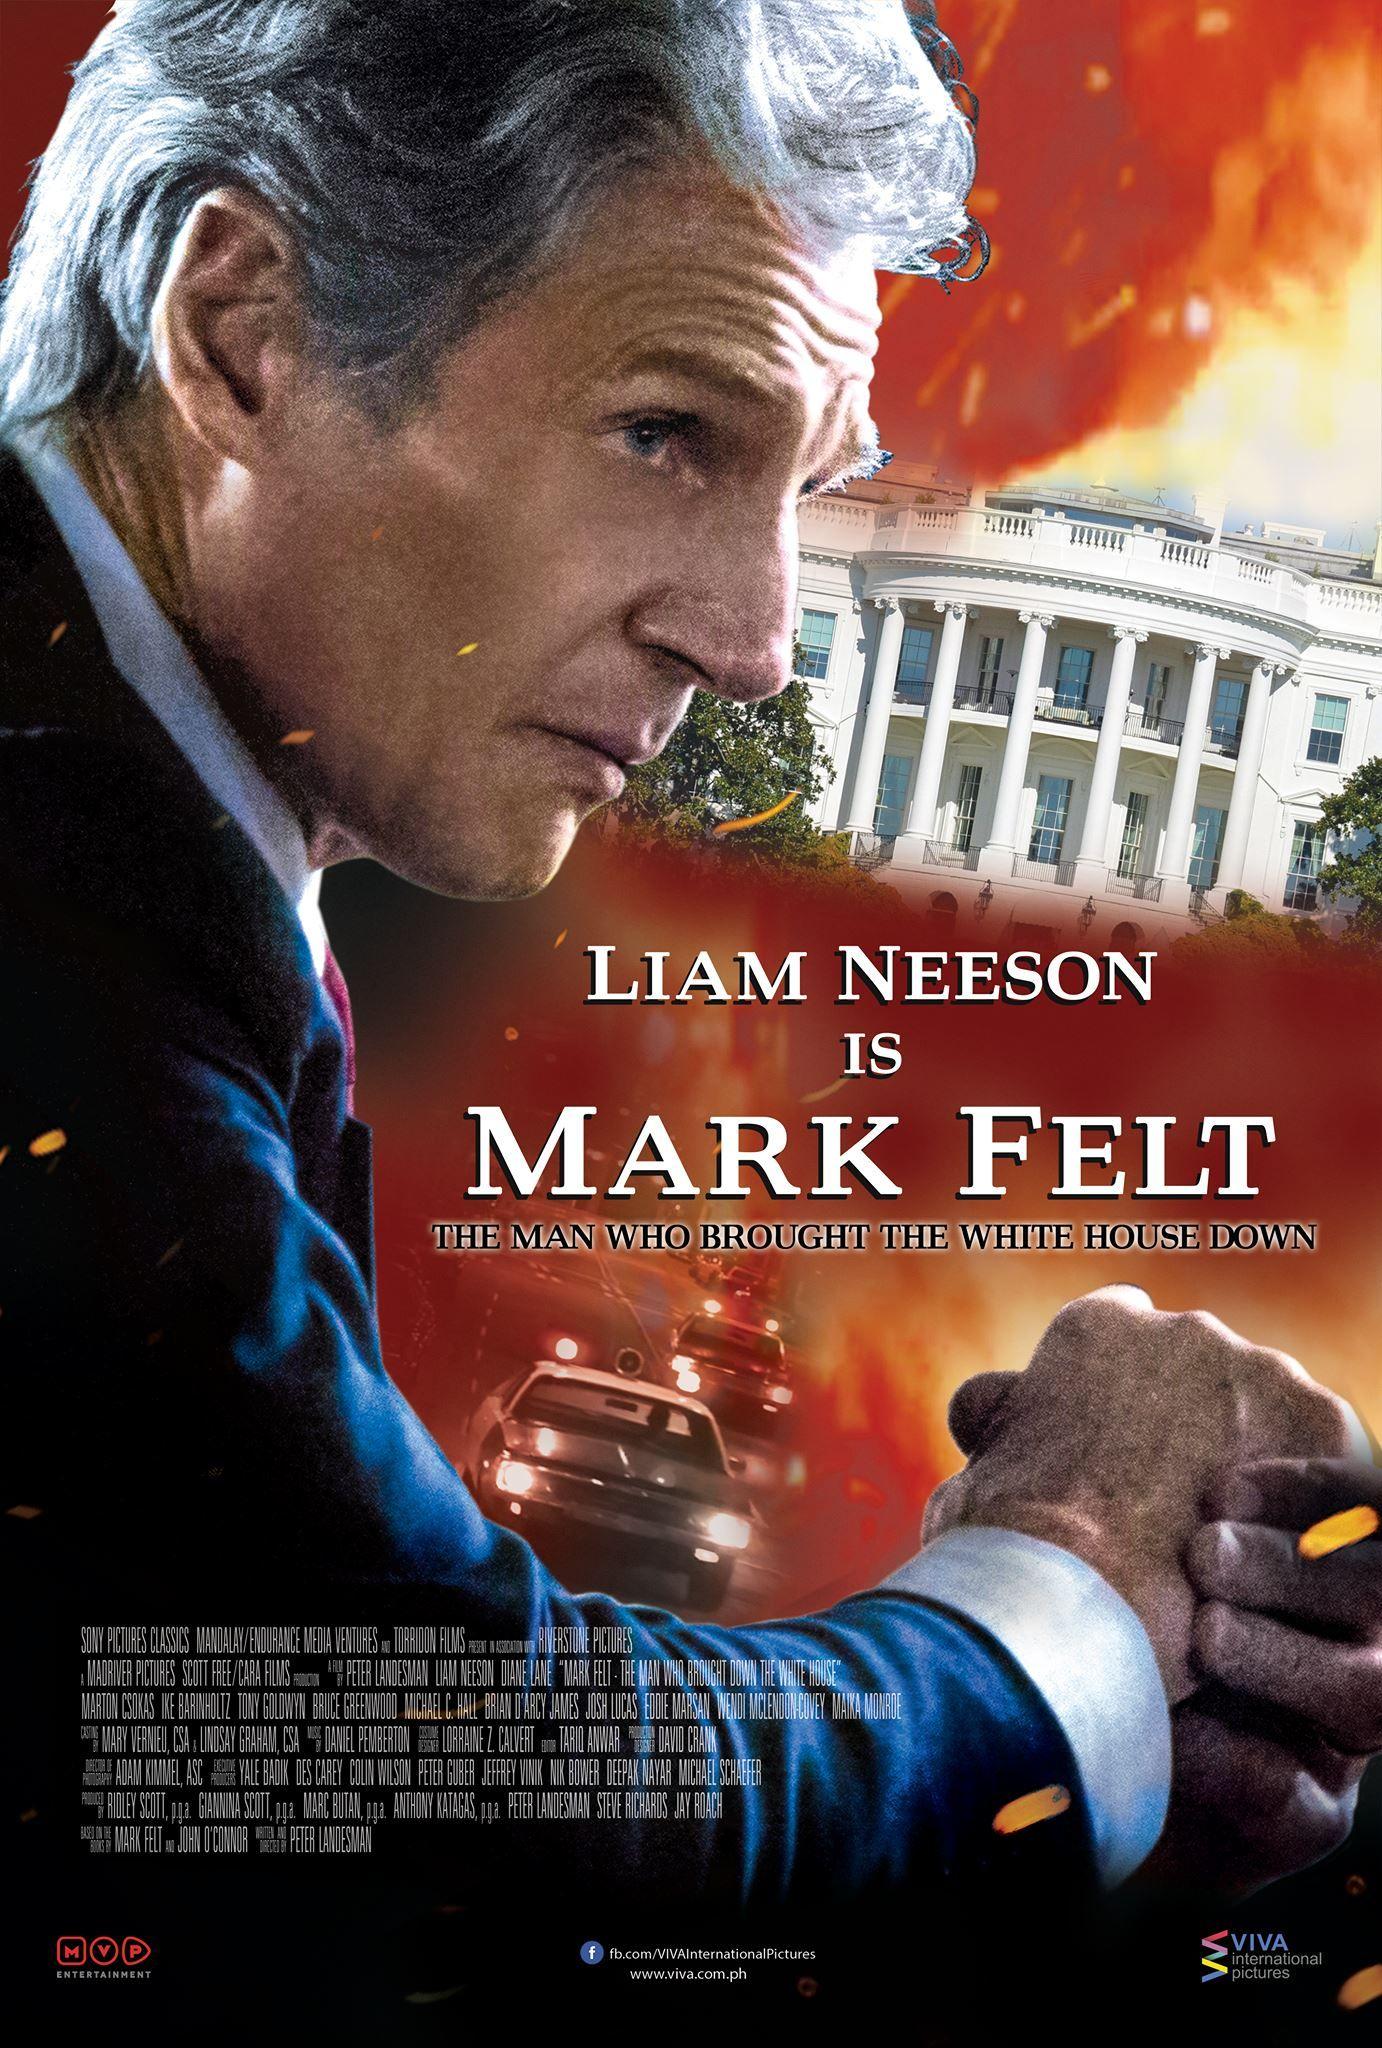 Mark felt good movies great movies movies